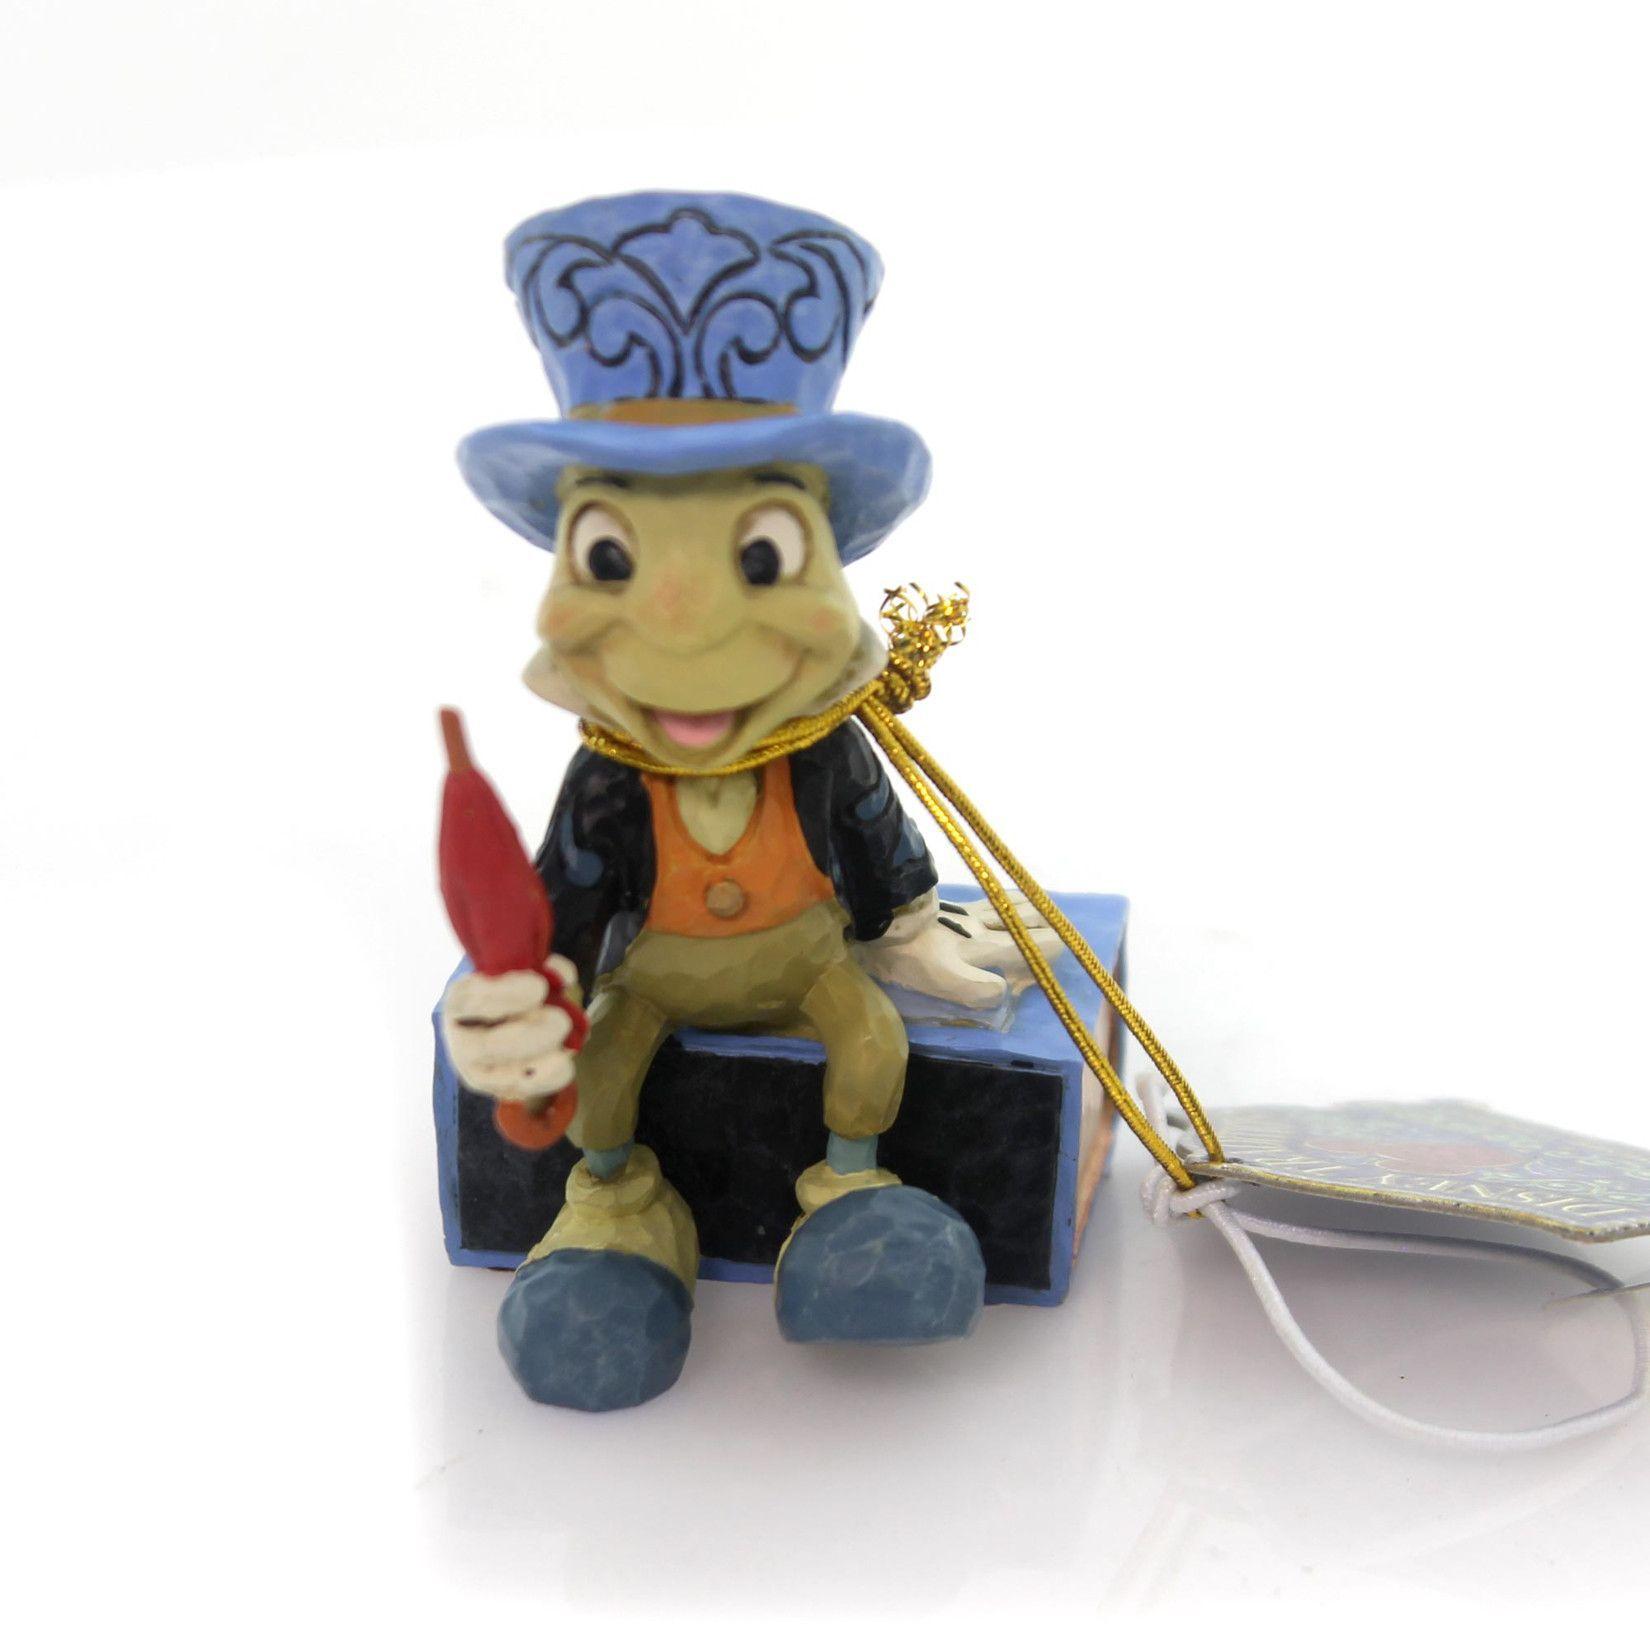 Jim Shore Jiminy Cricket On A Match Box Figurine Jiminy Cricket Cricket Crafts Sand Crafts